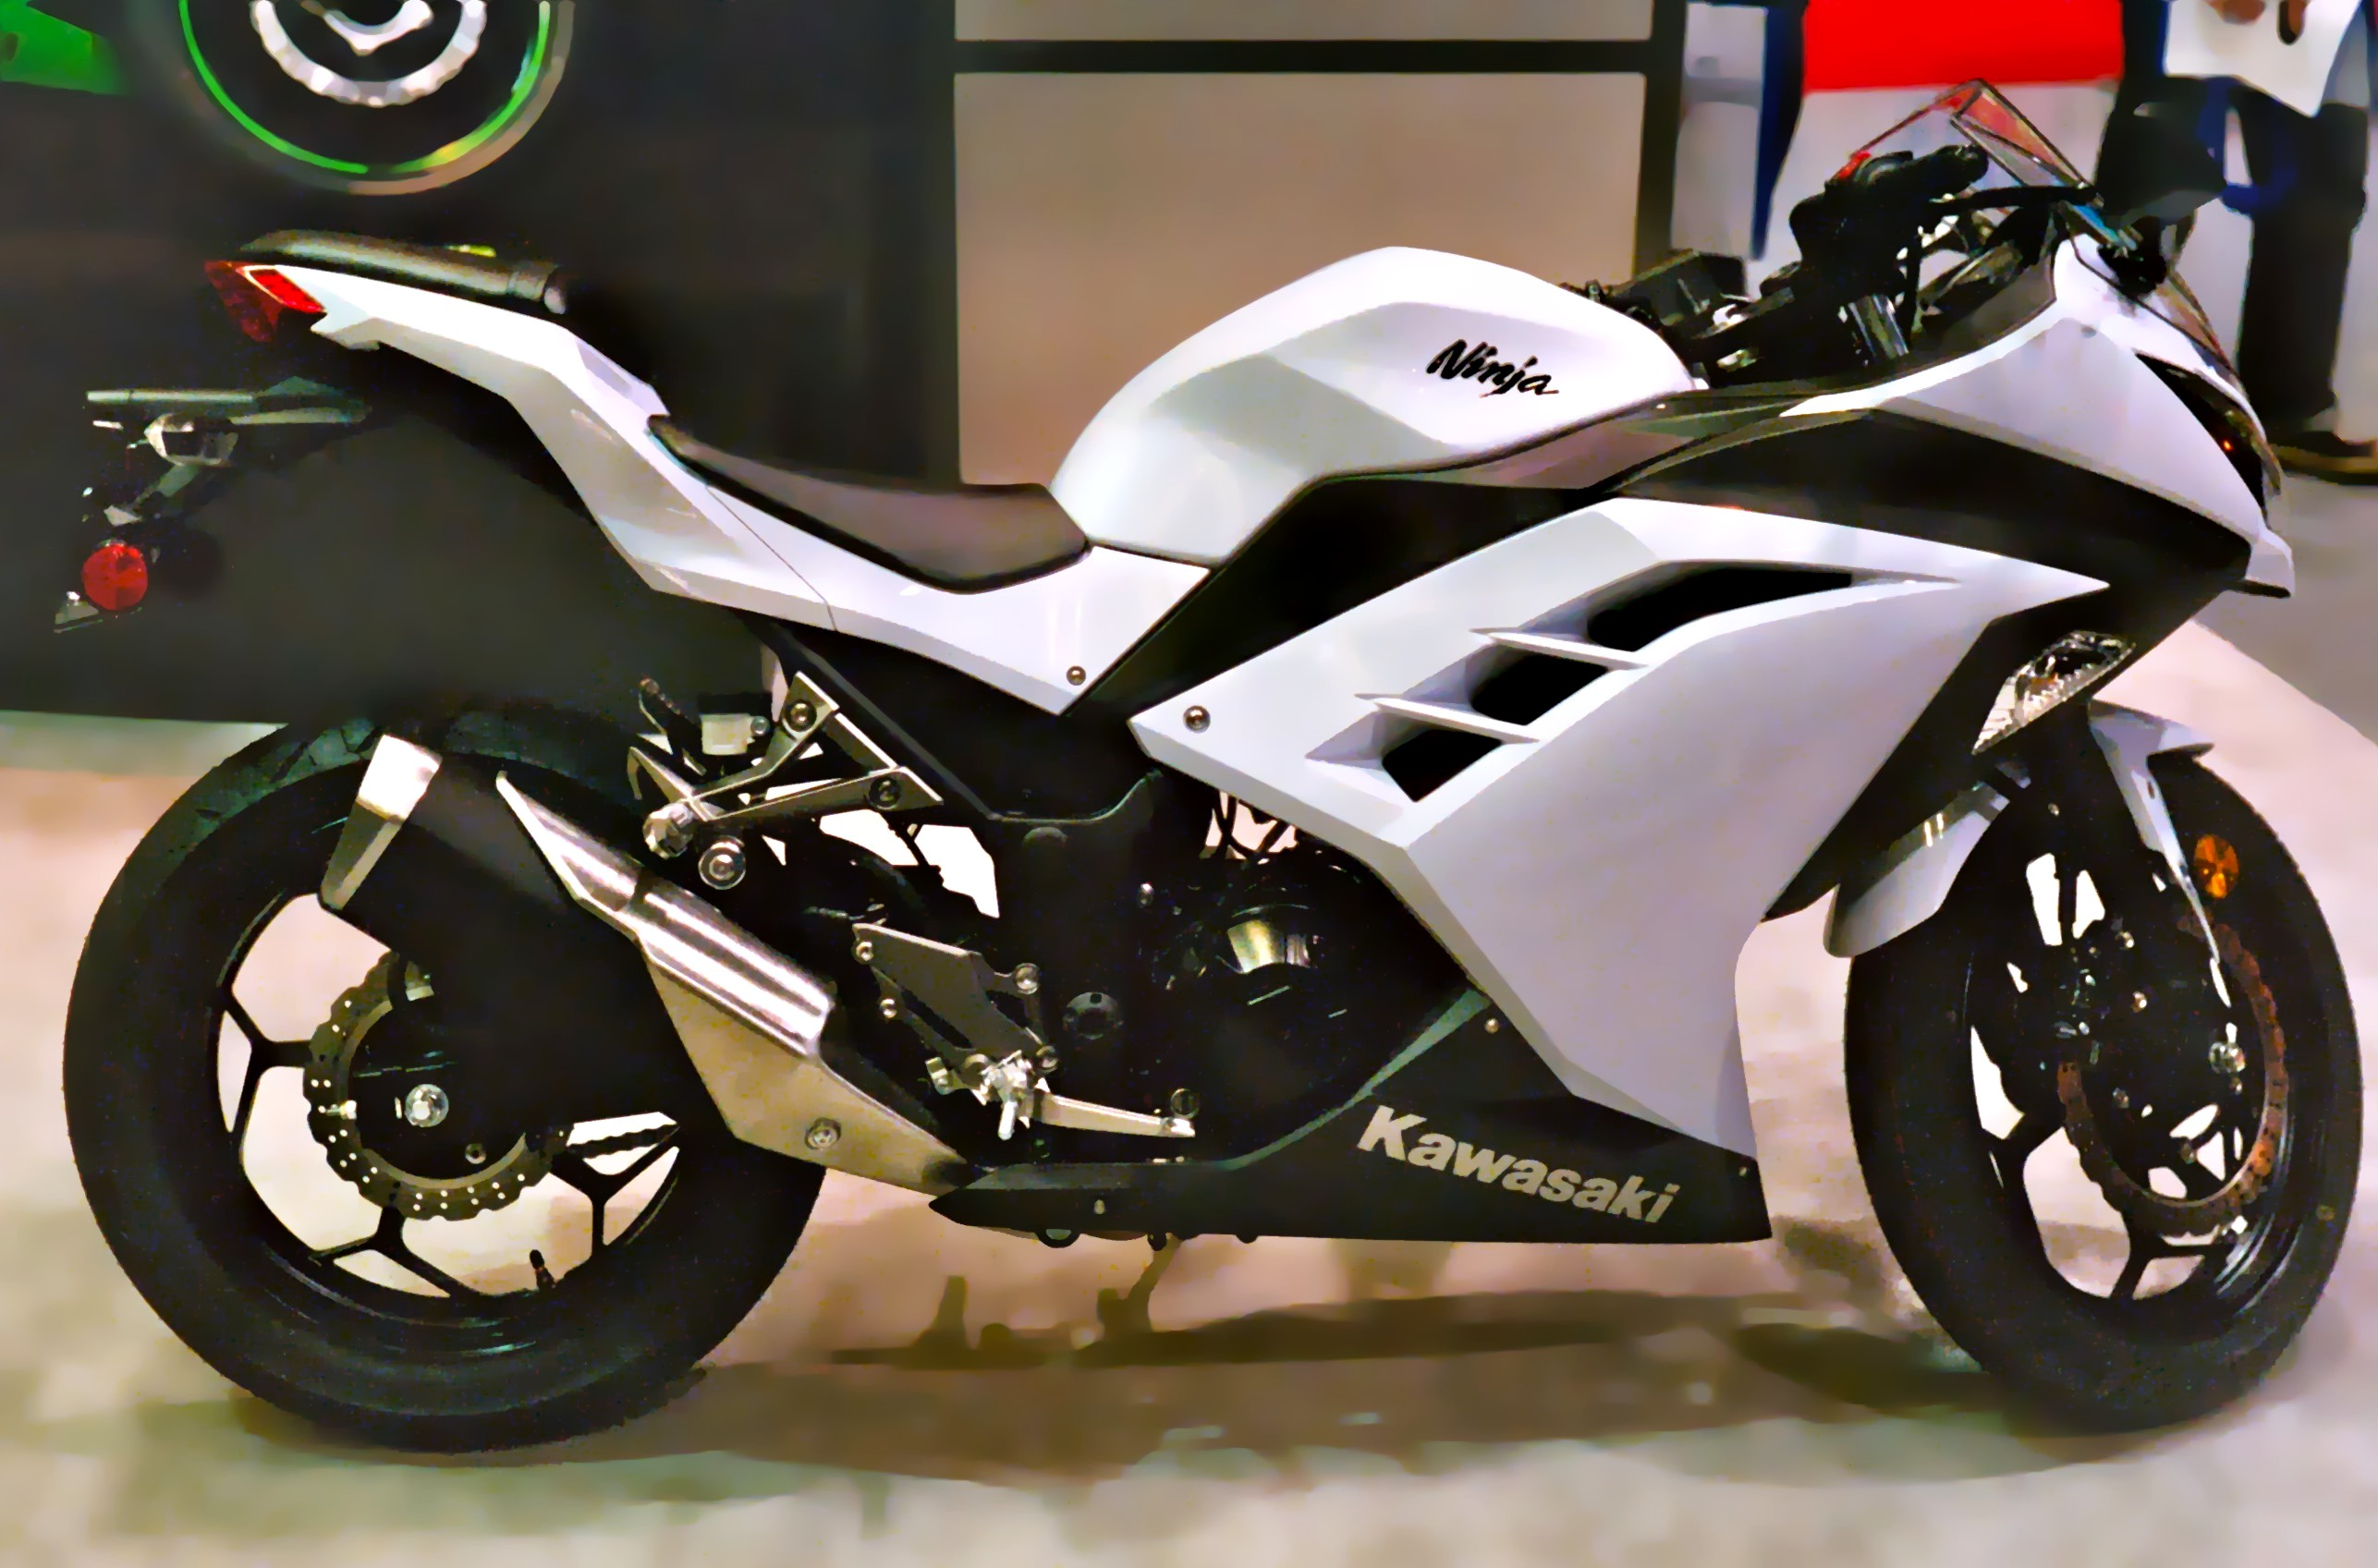 Kawasaki 2013_Kawasaki_Ninja_300_Seattle_Motorcycle_Show